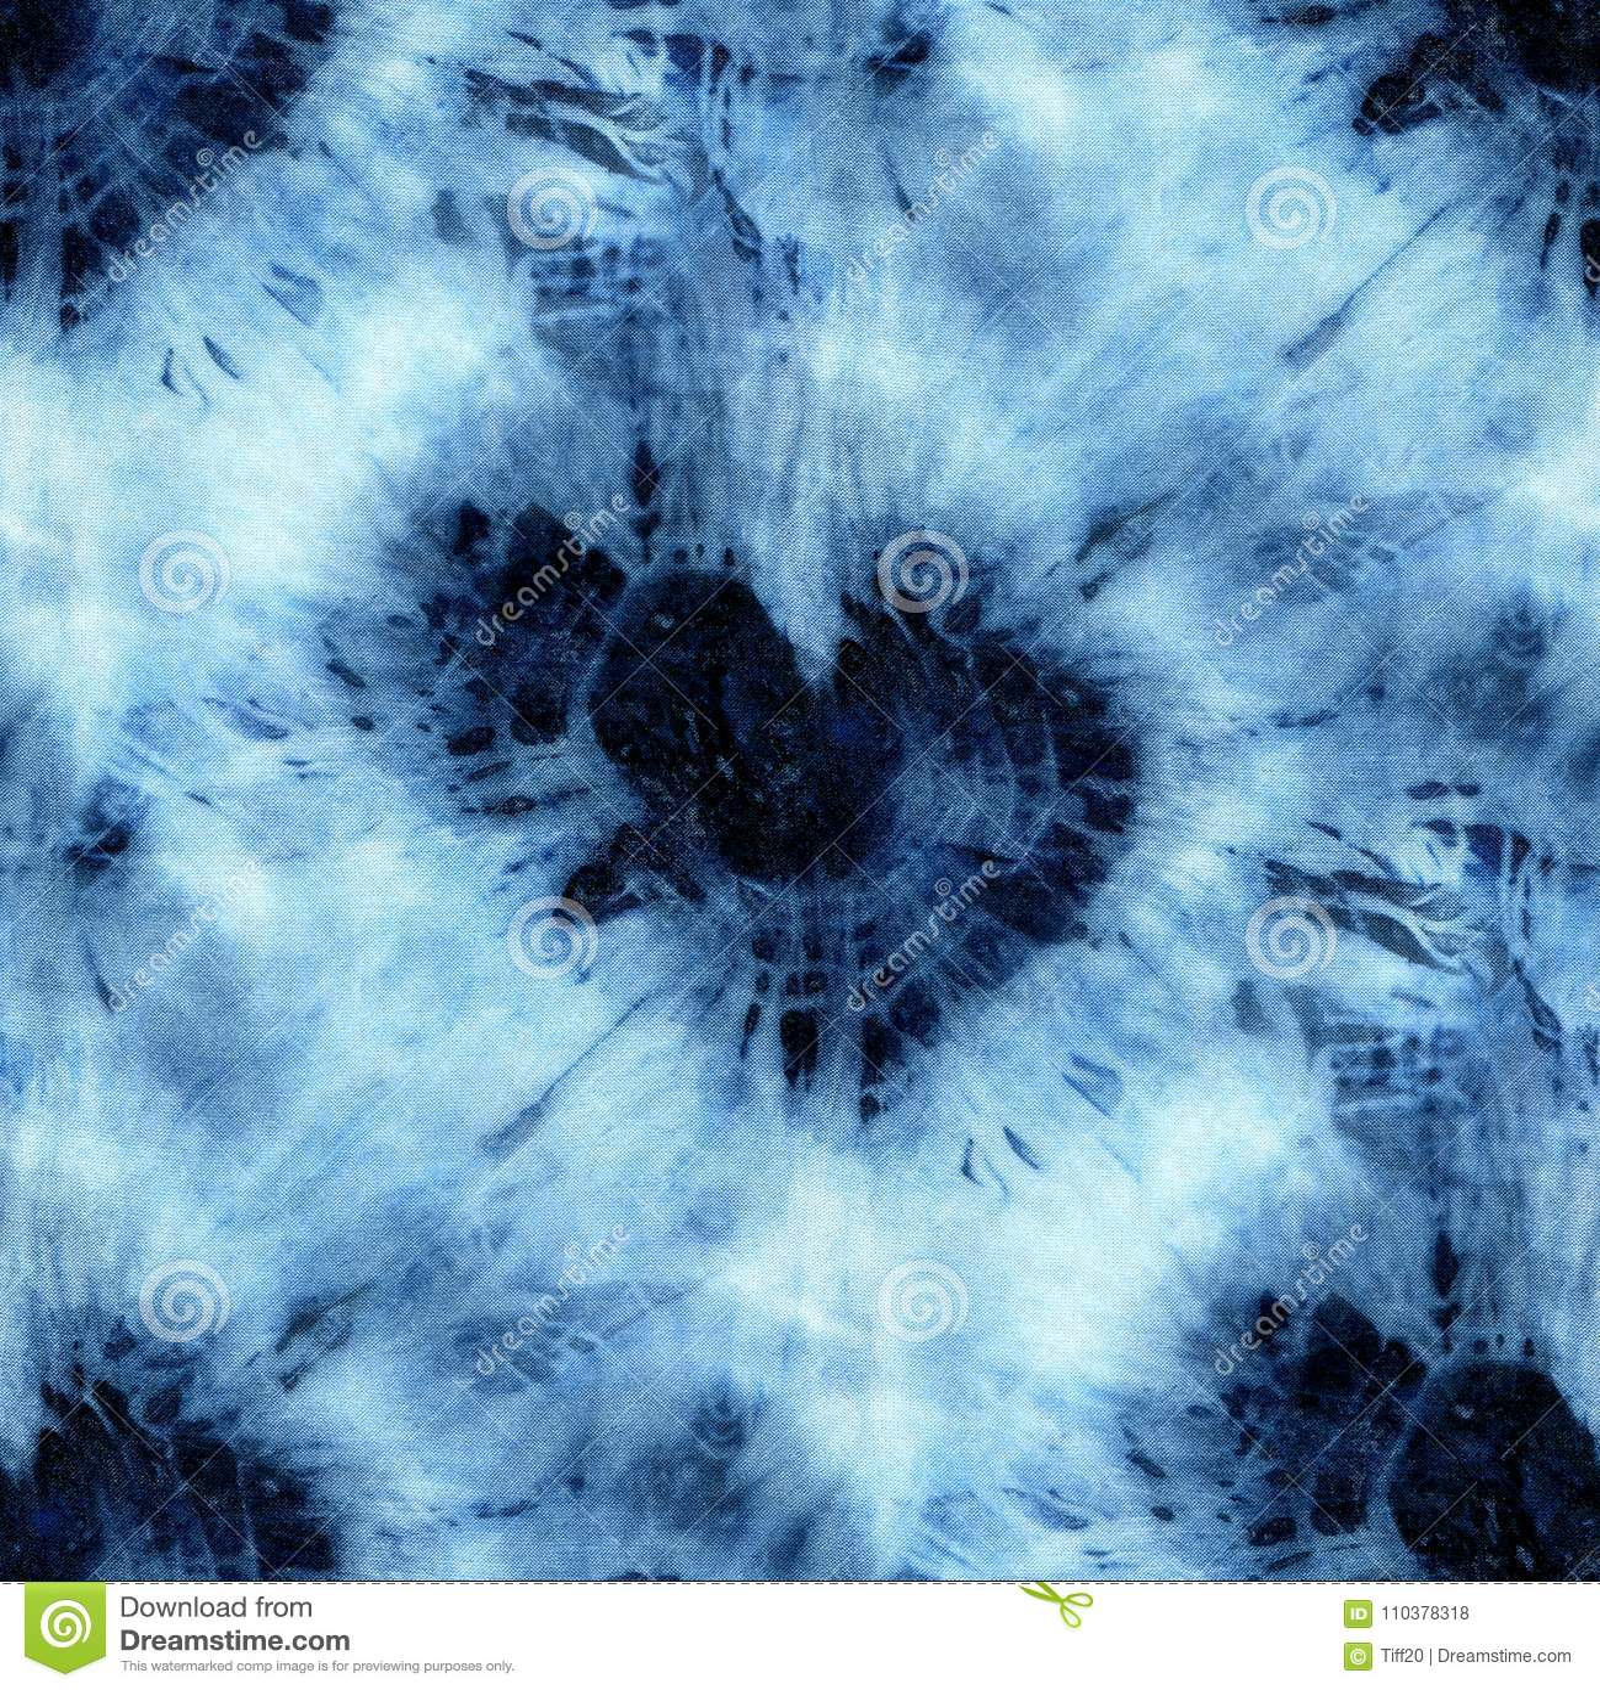 Seamless tie-dye pattern of indigo color on white silk